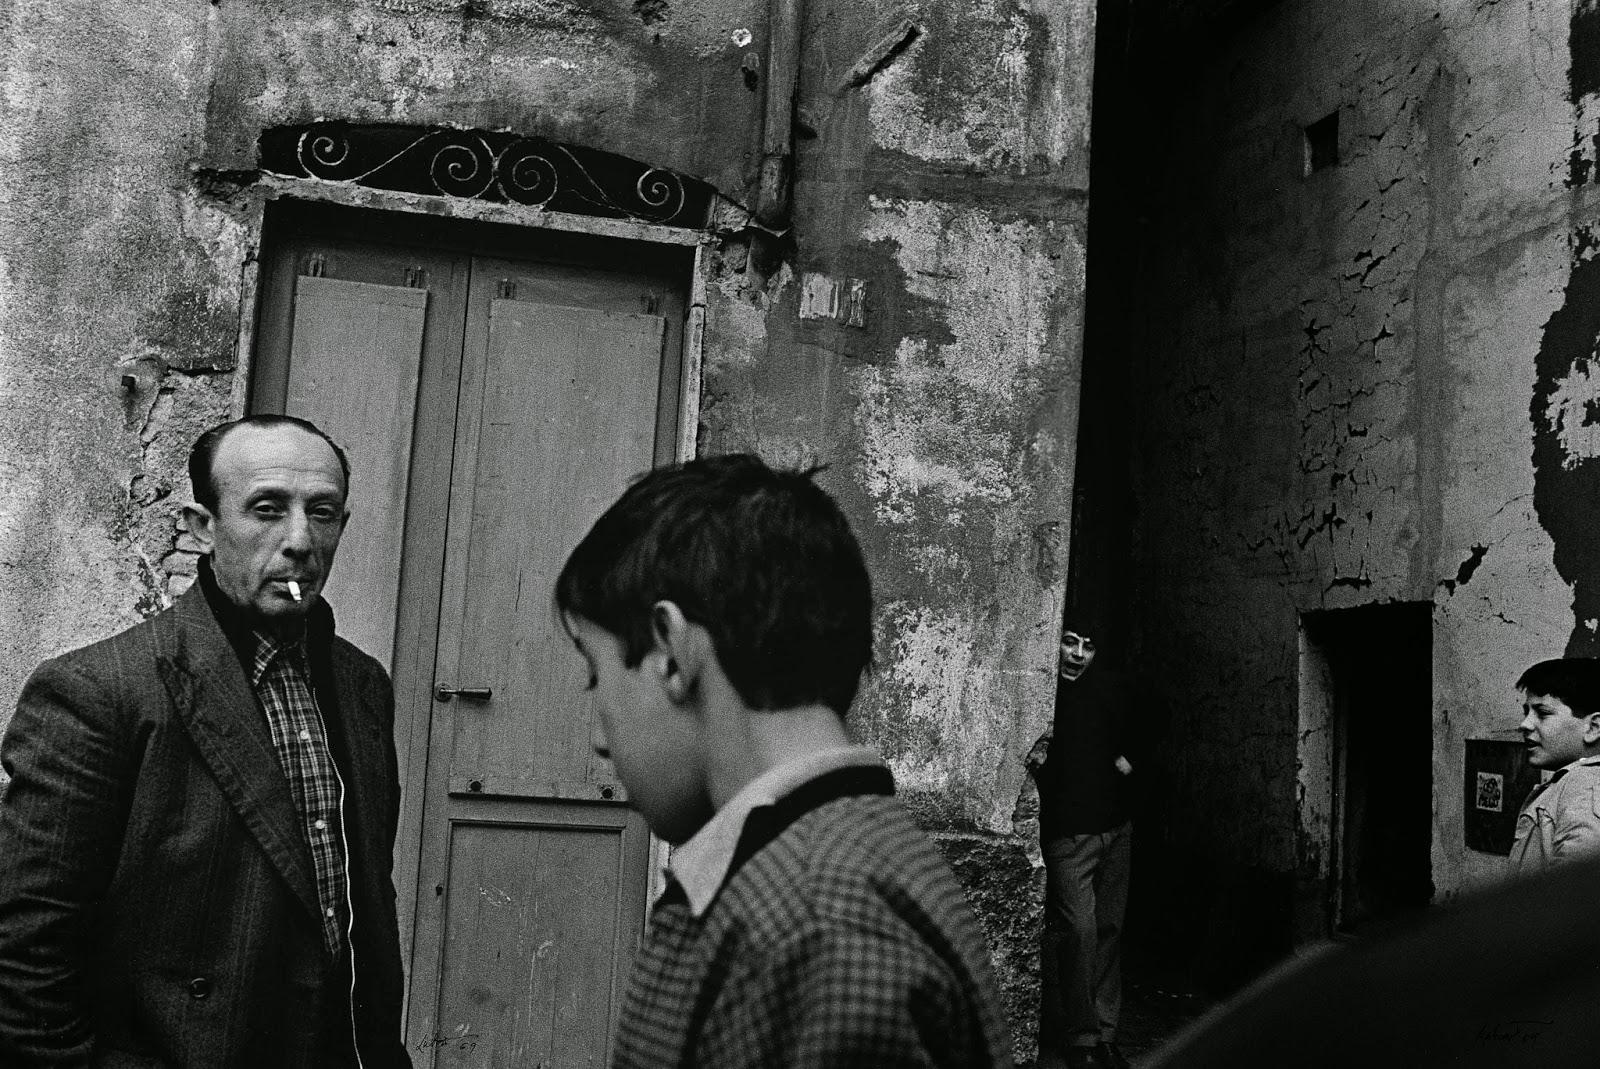 Quartiere Vecchio - Génova 1969